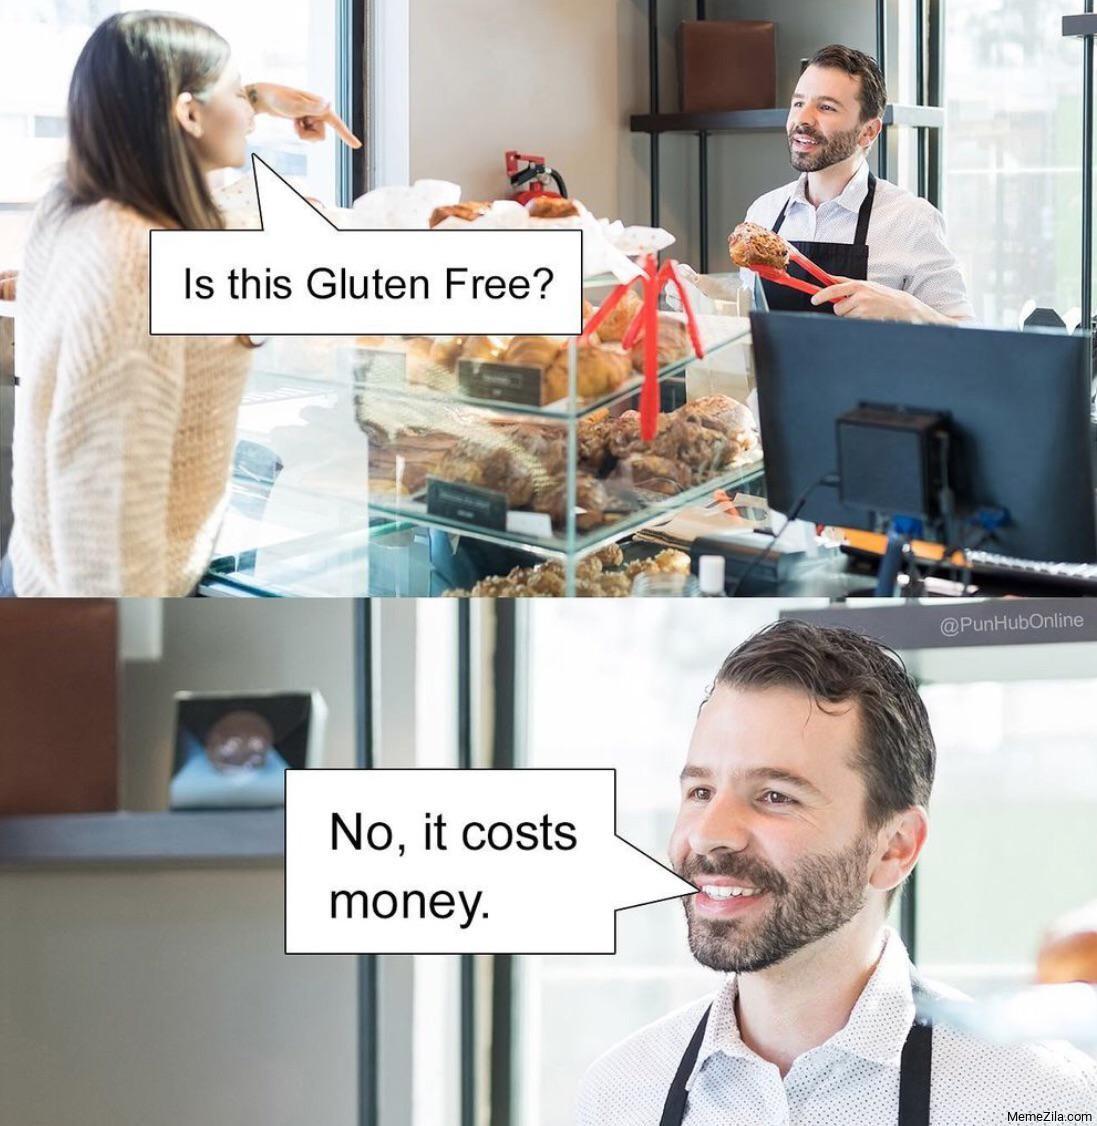 Is this gluten free No it costs money meme